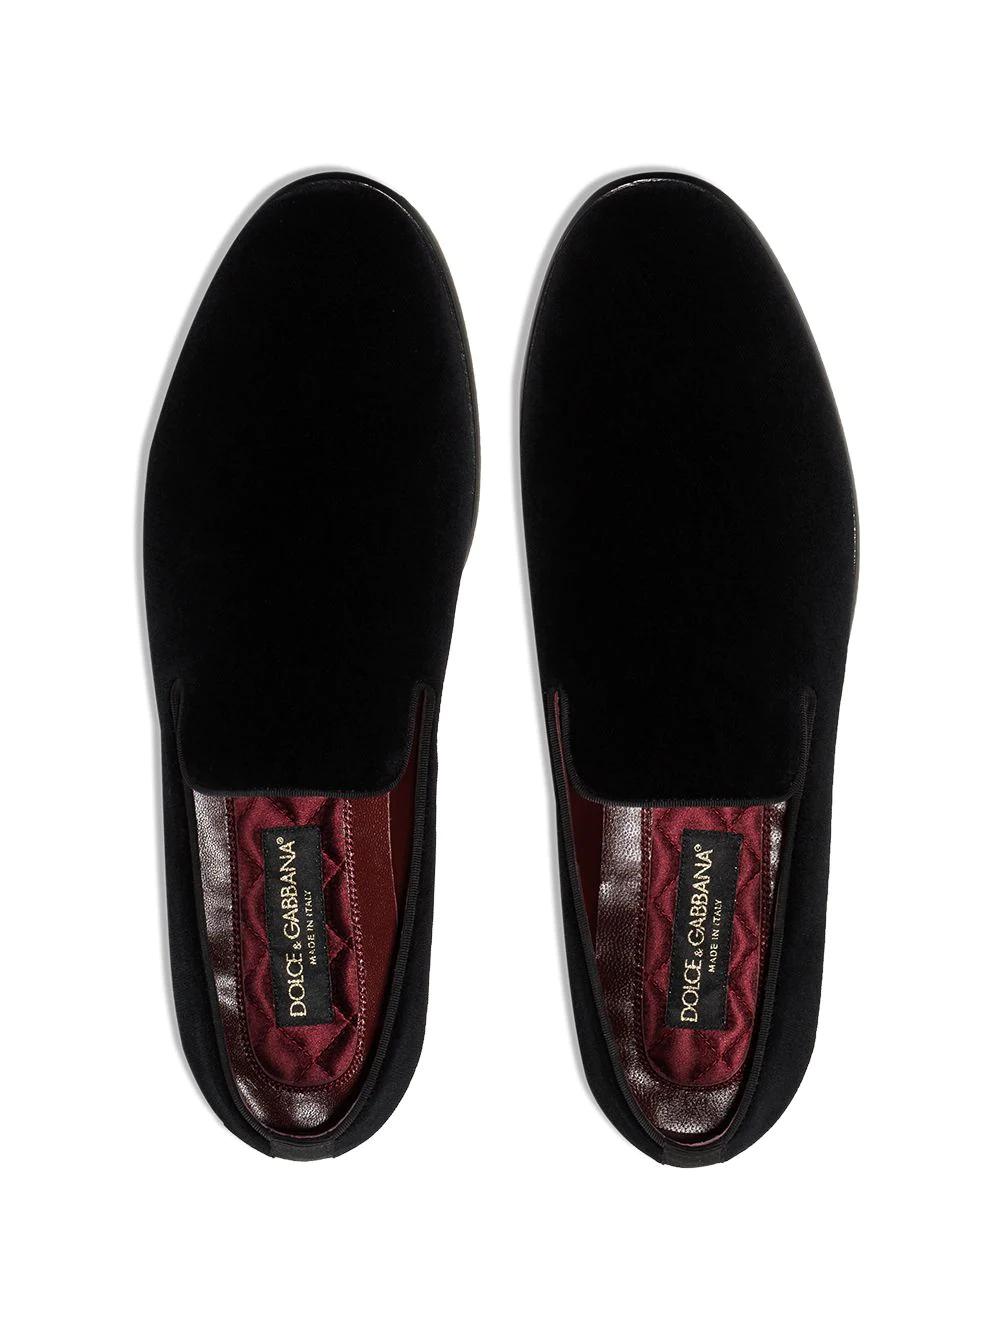 Dolce & Gabbana | Dolce & Gabbana бархатные лоферы | Clouty